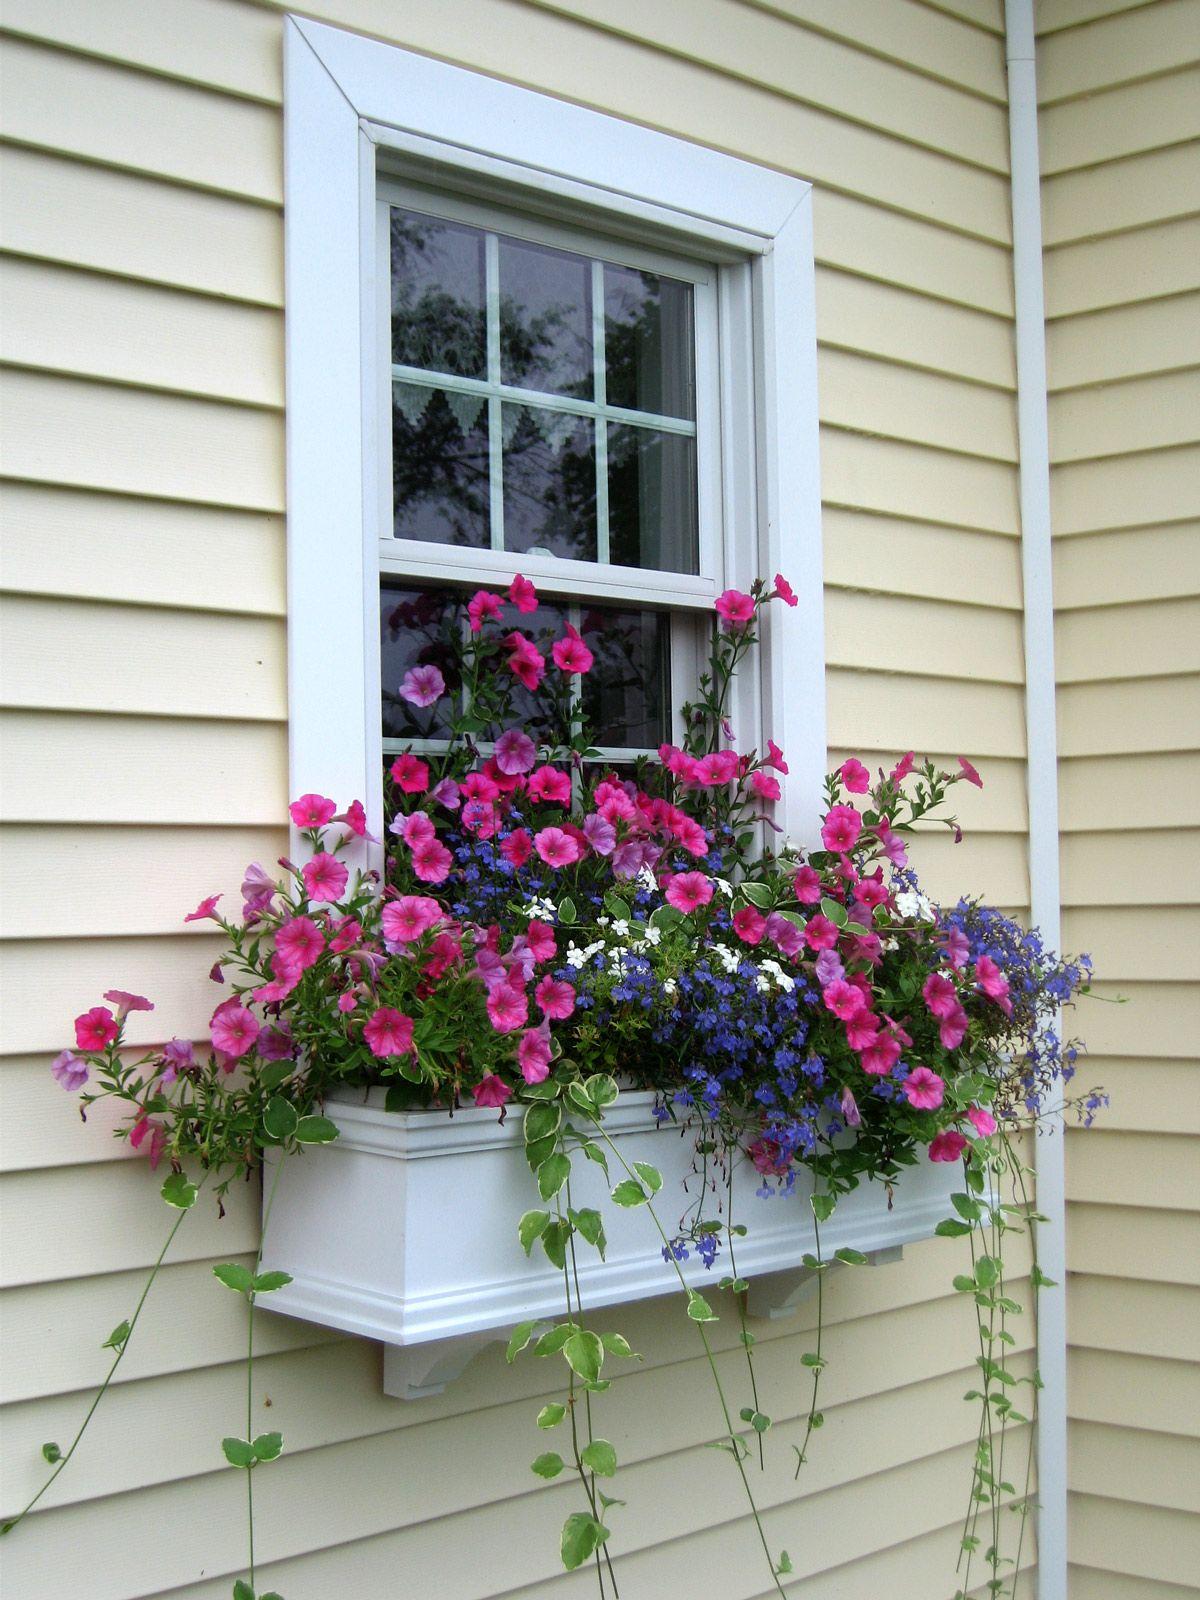 window box contest entry windowbox new gardening ideas